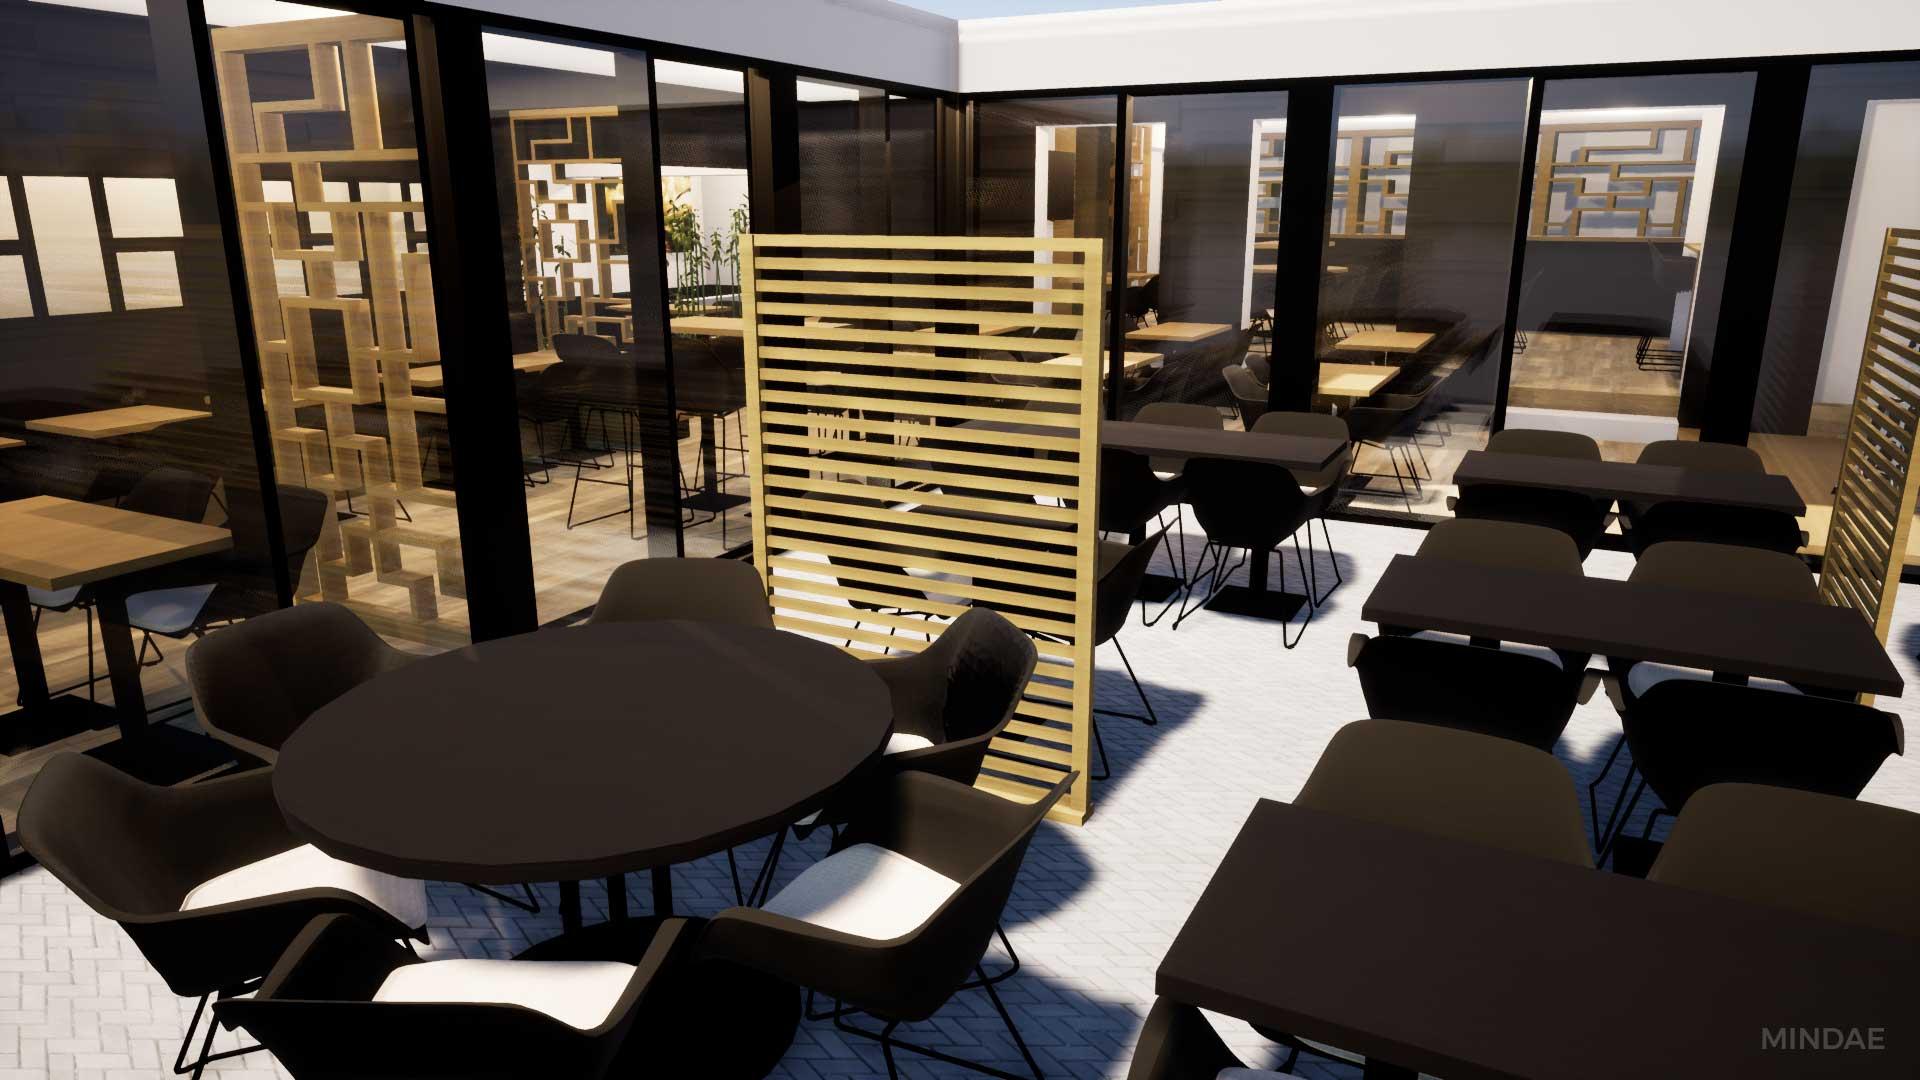 Mindae_3D_restaurant_caen_republique_agencement_bois_terrasse_comptoir-(6)